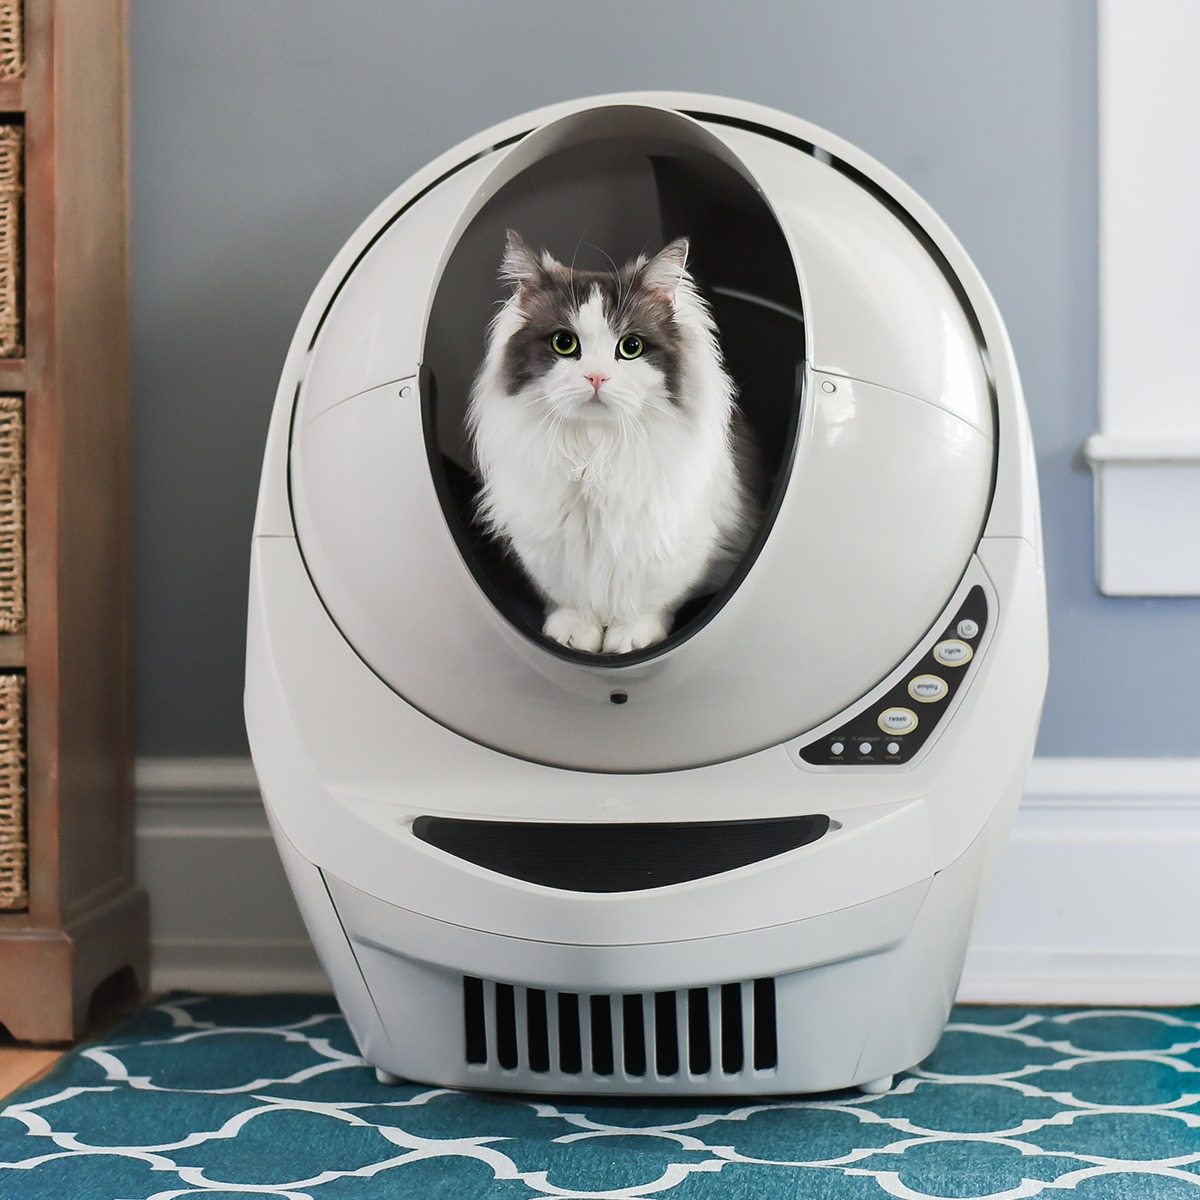 Automatic cat litter box